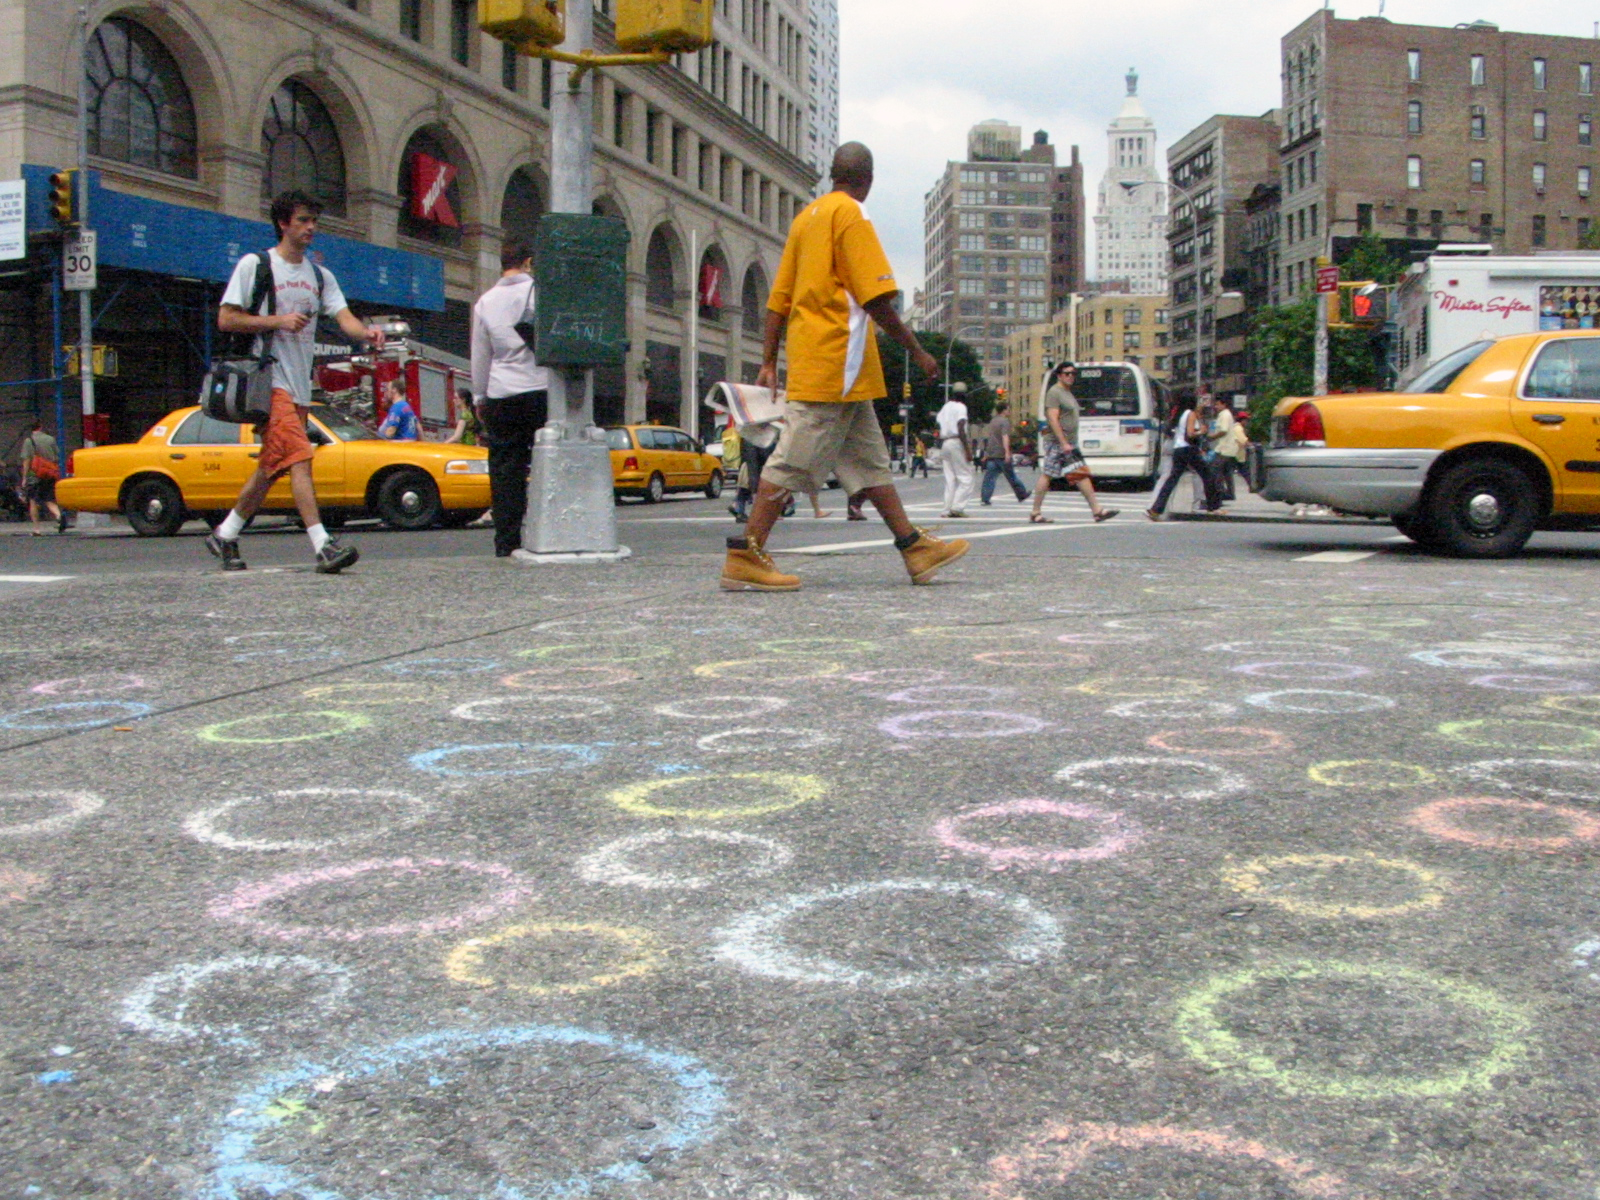 Circles, Astor Place, New York City